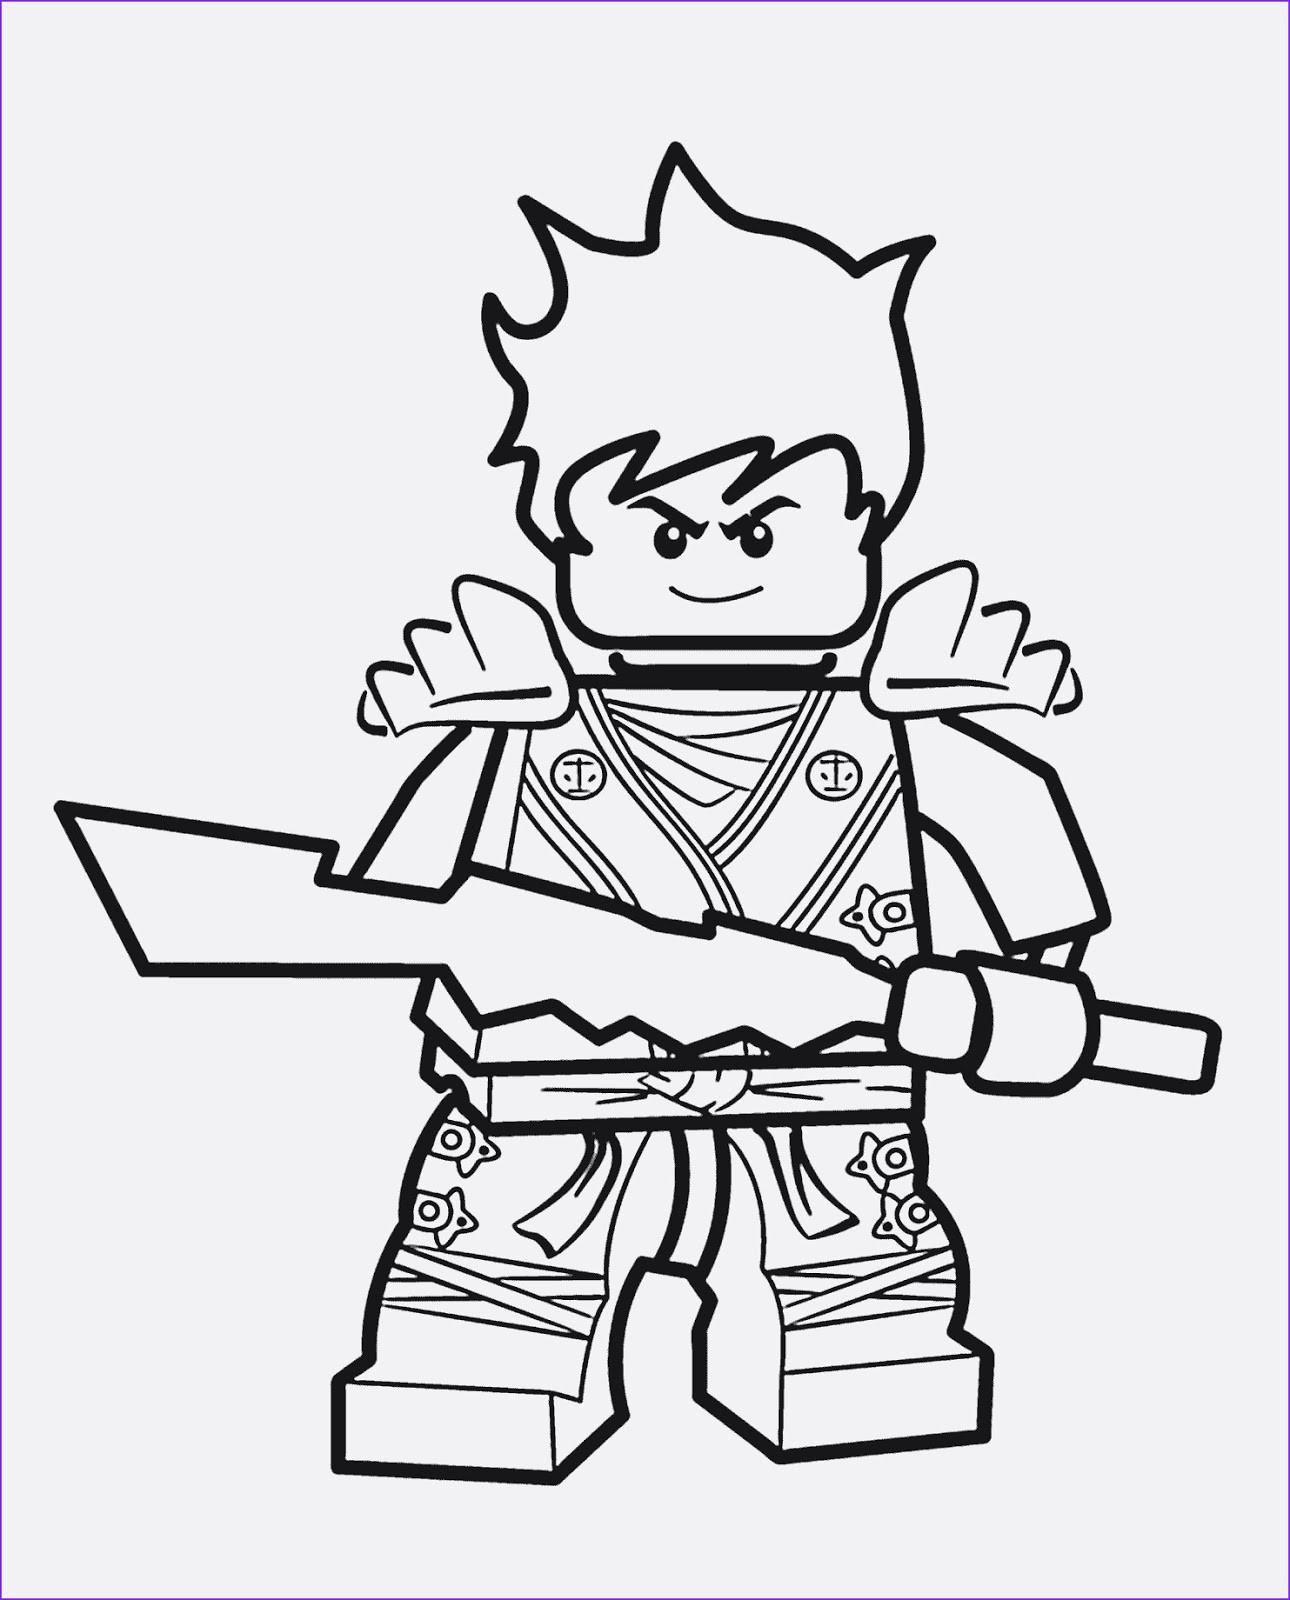 Ninja Ausmalbilder  Ausmalbilder Lego Ninjago Lego Ninjago zum Ausmalen